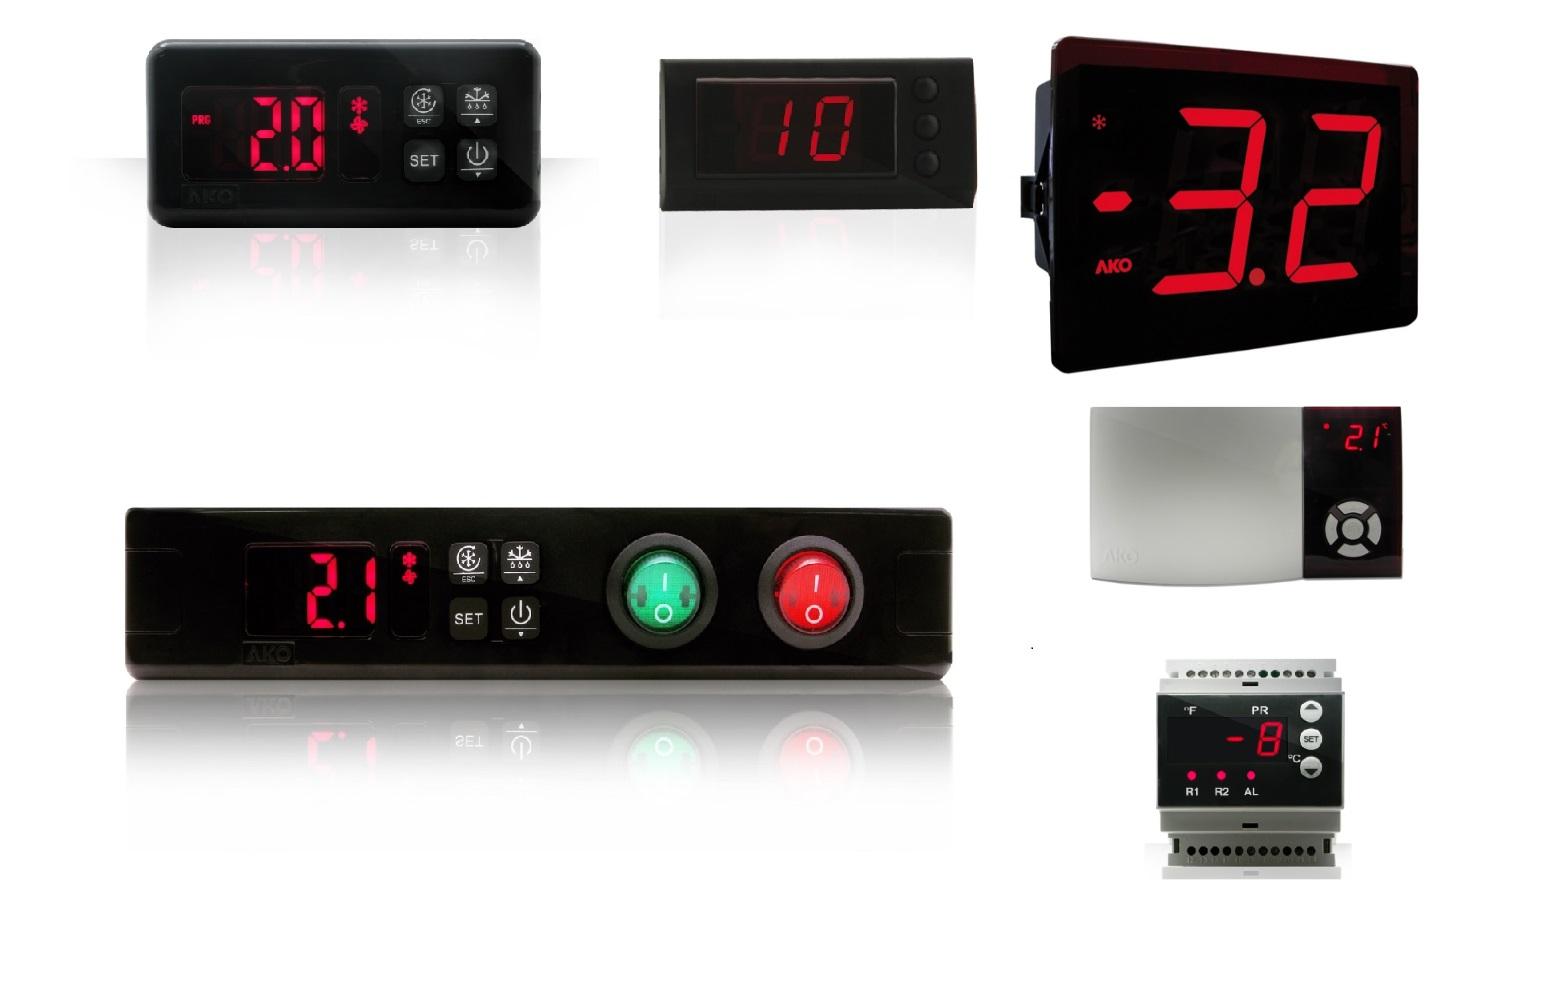 AKOCONTROL-controles-panel